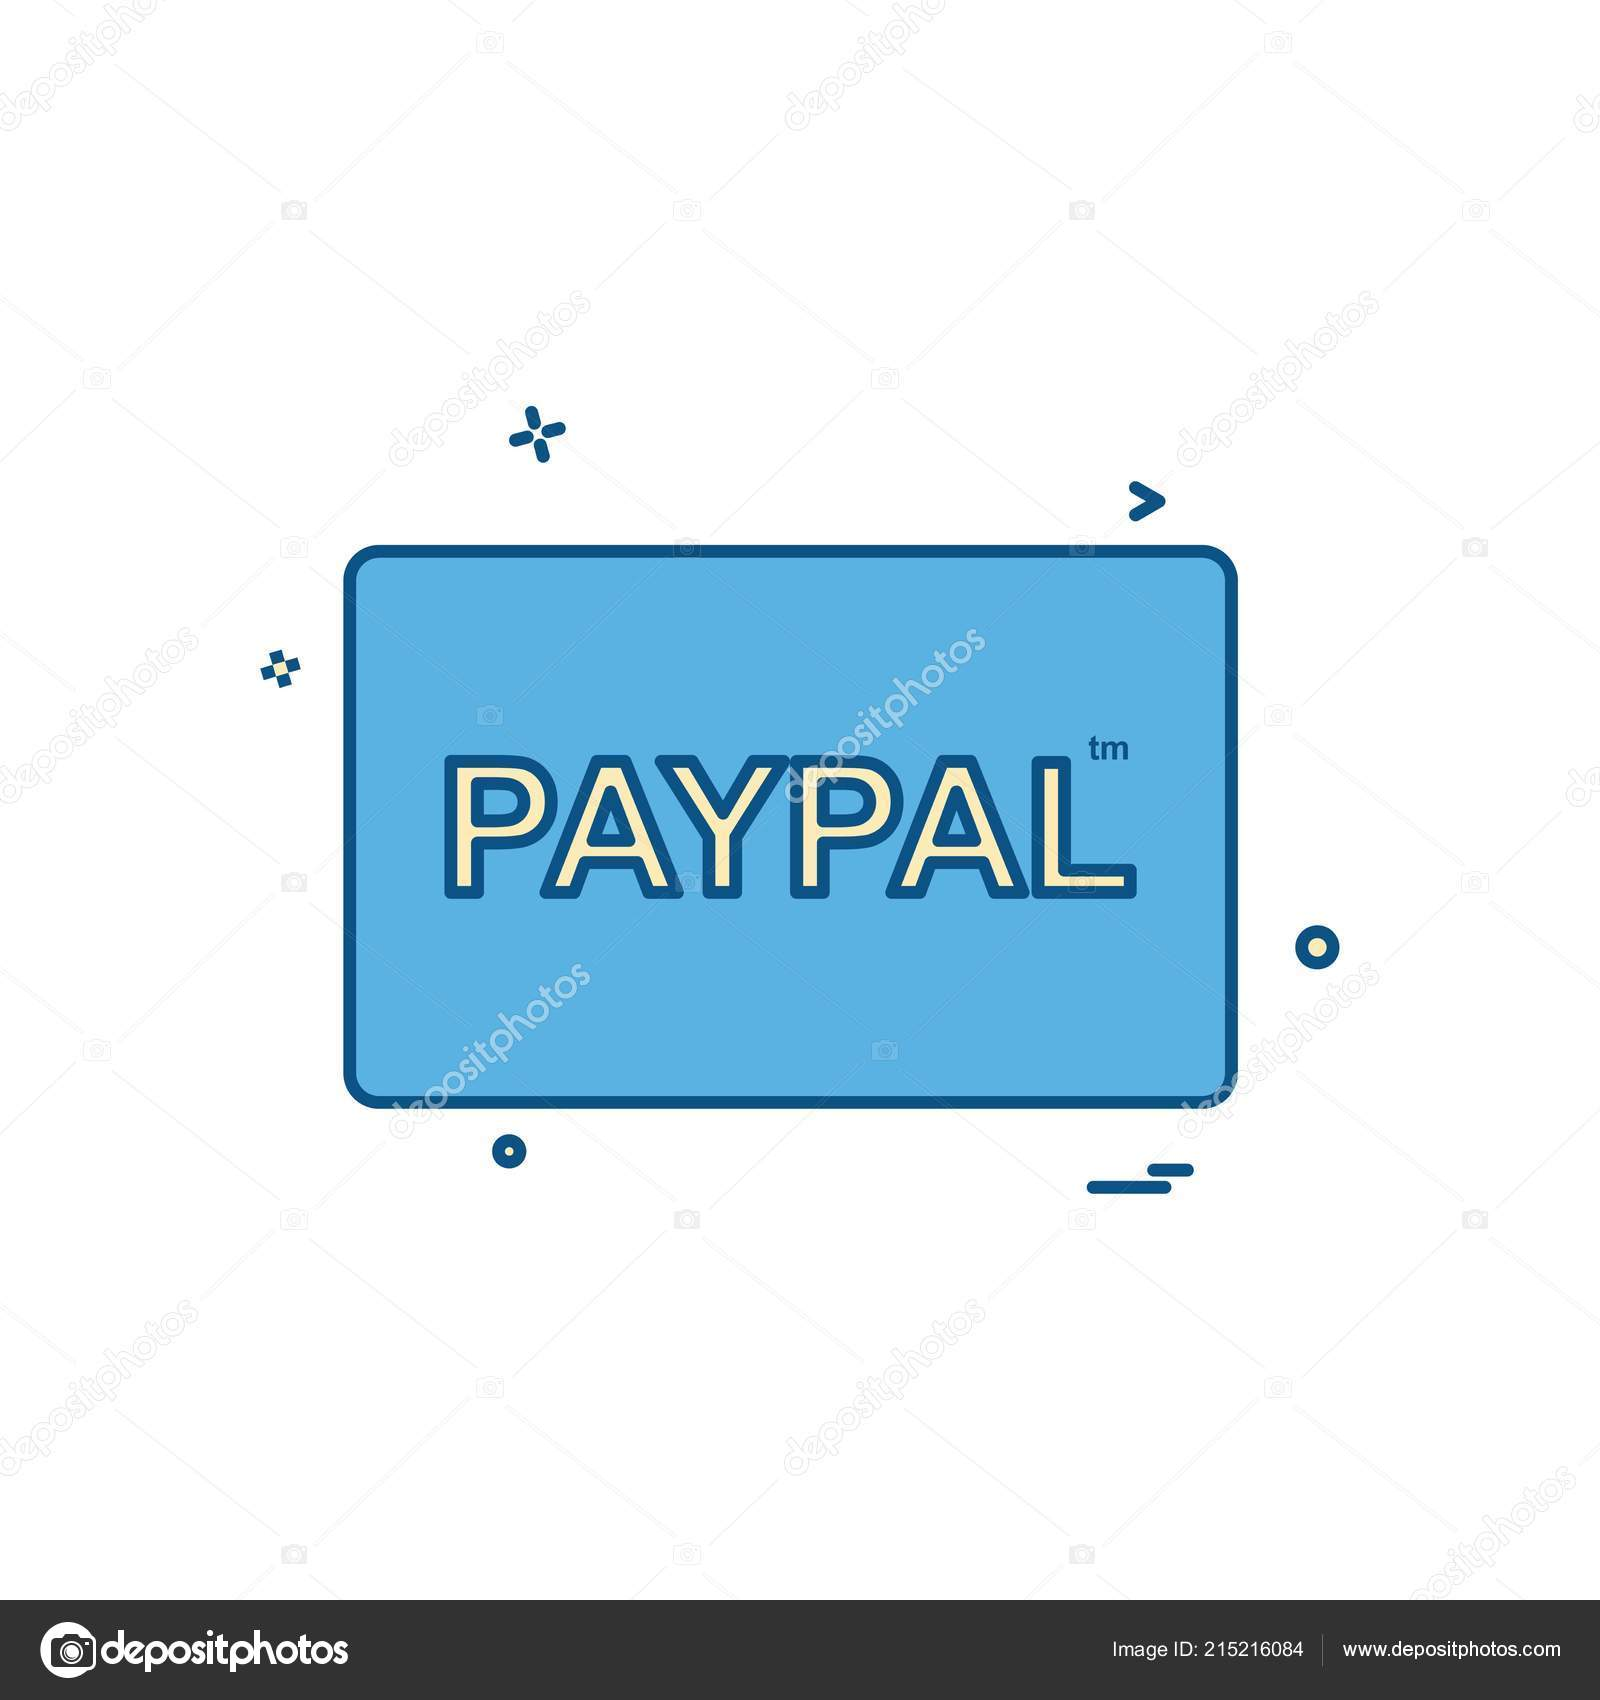 Paypal Karte.Paypal Karte Icon Design Stockvektor C Ibrandify 215216084